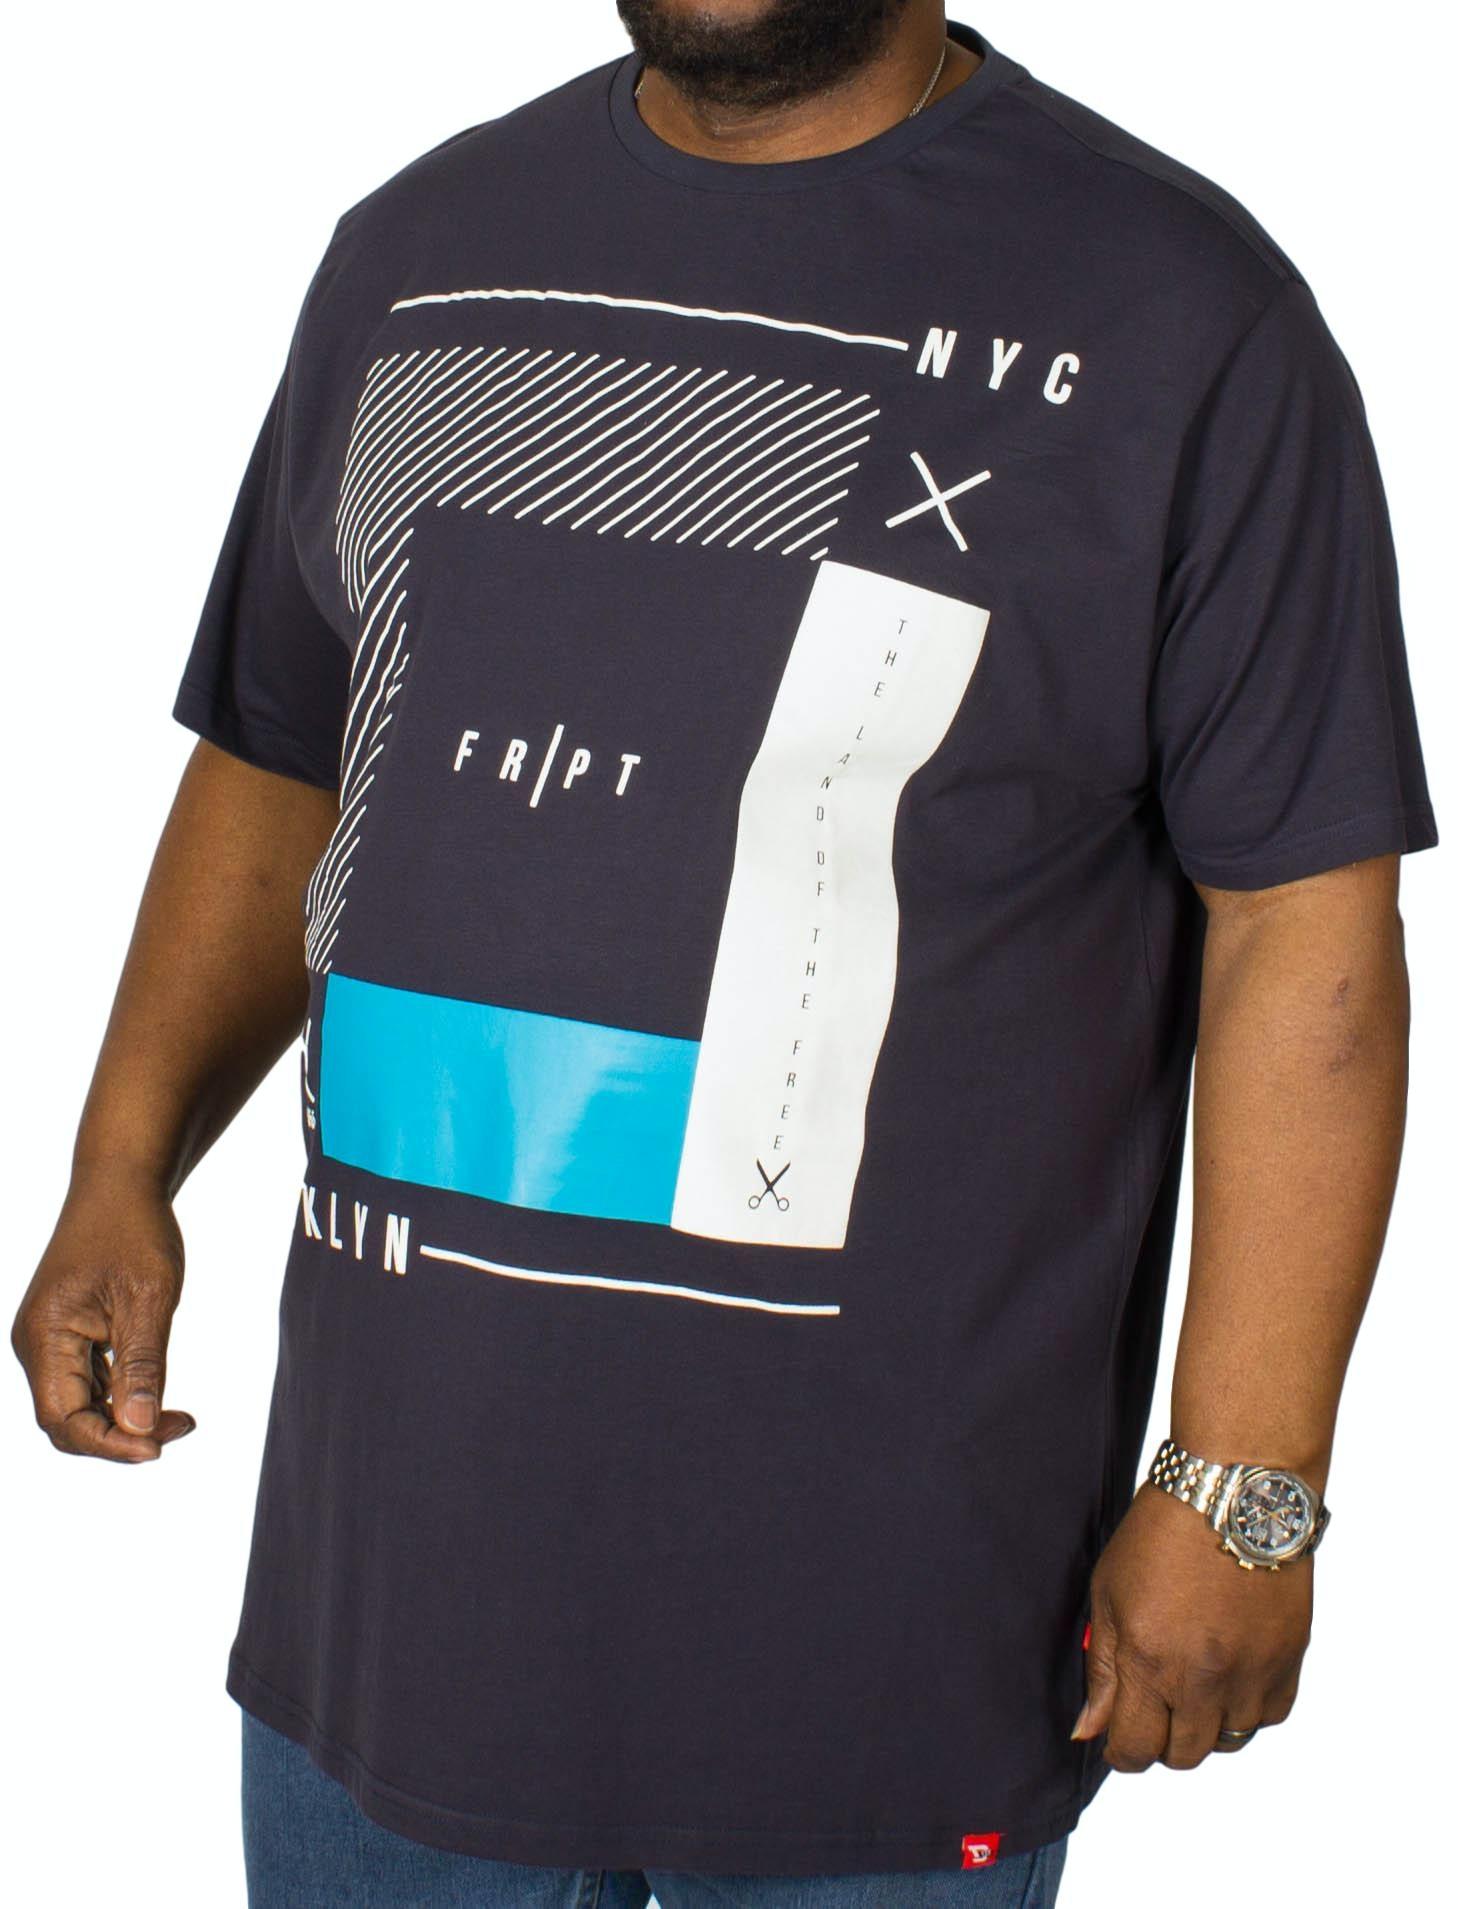 D555 Kenton Printed T-Shirt Navy